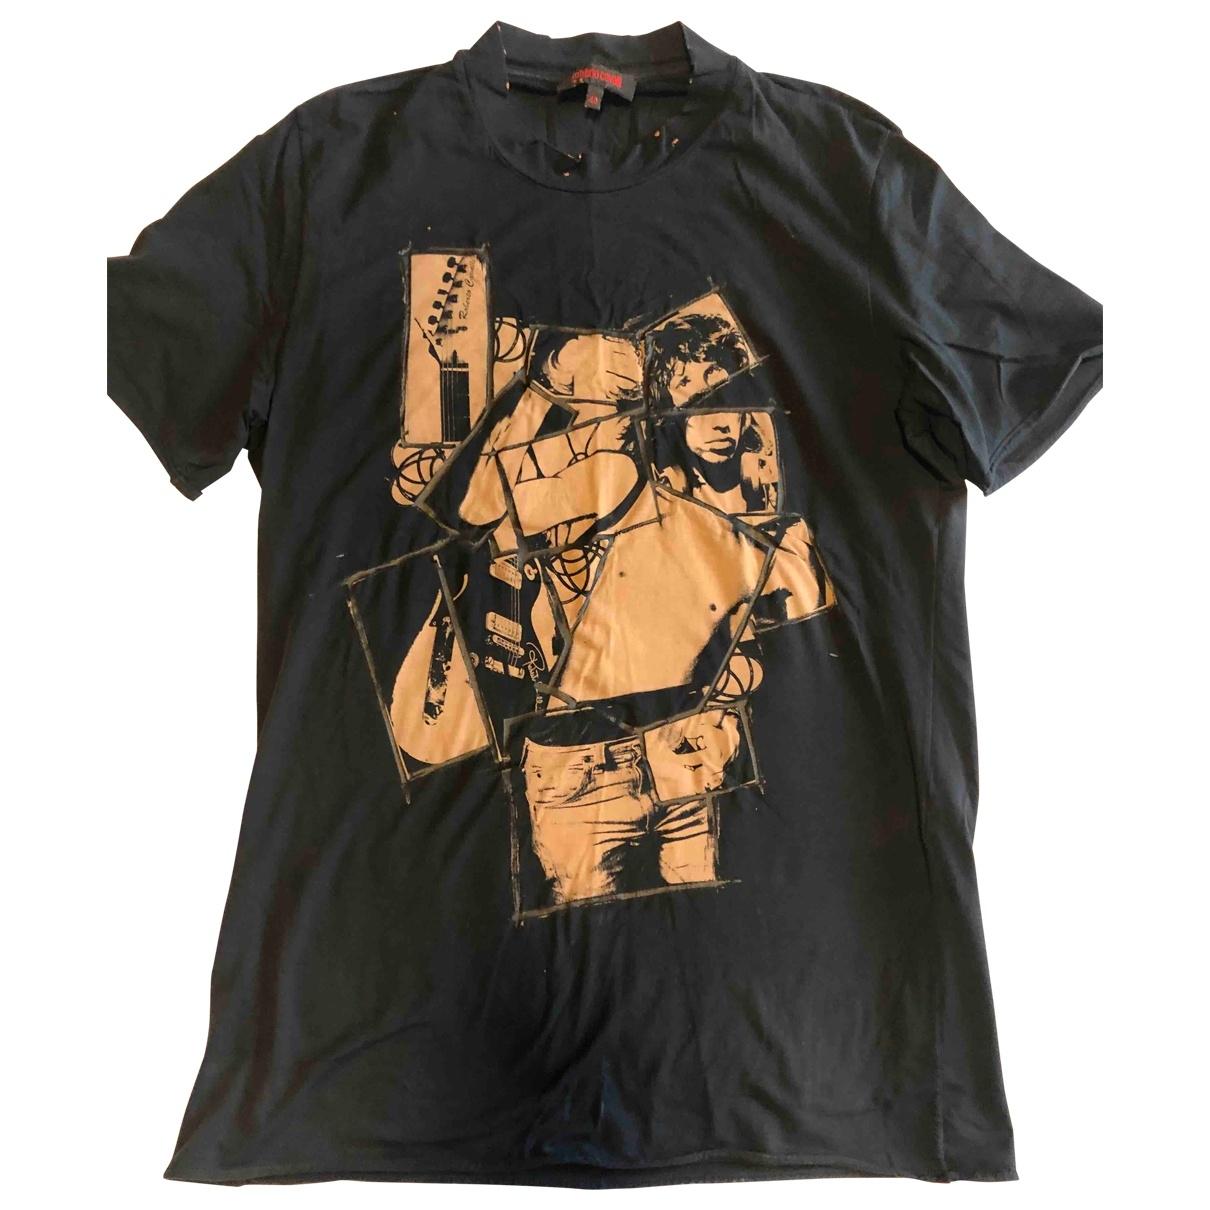 Roberto Cavalli - Tee shirts   pour homme en coton - marron